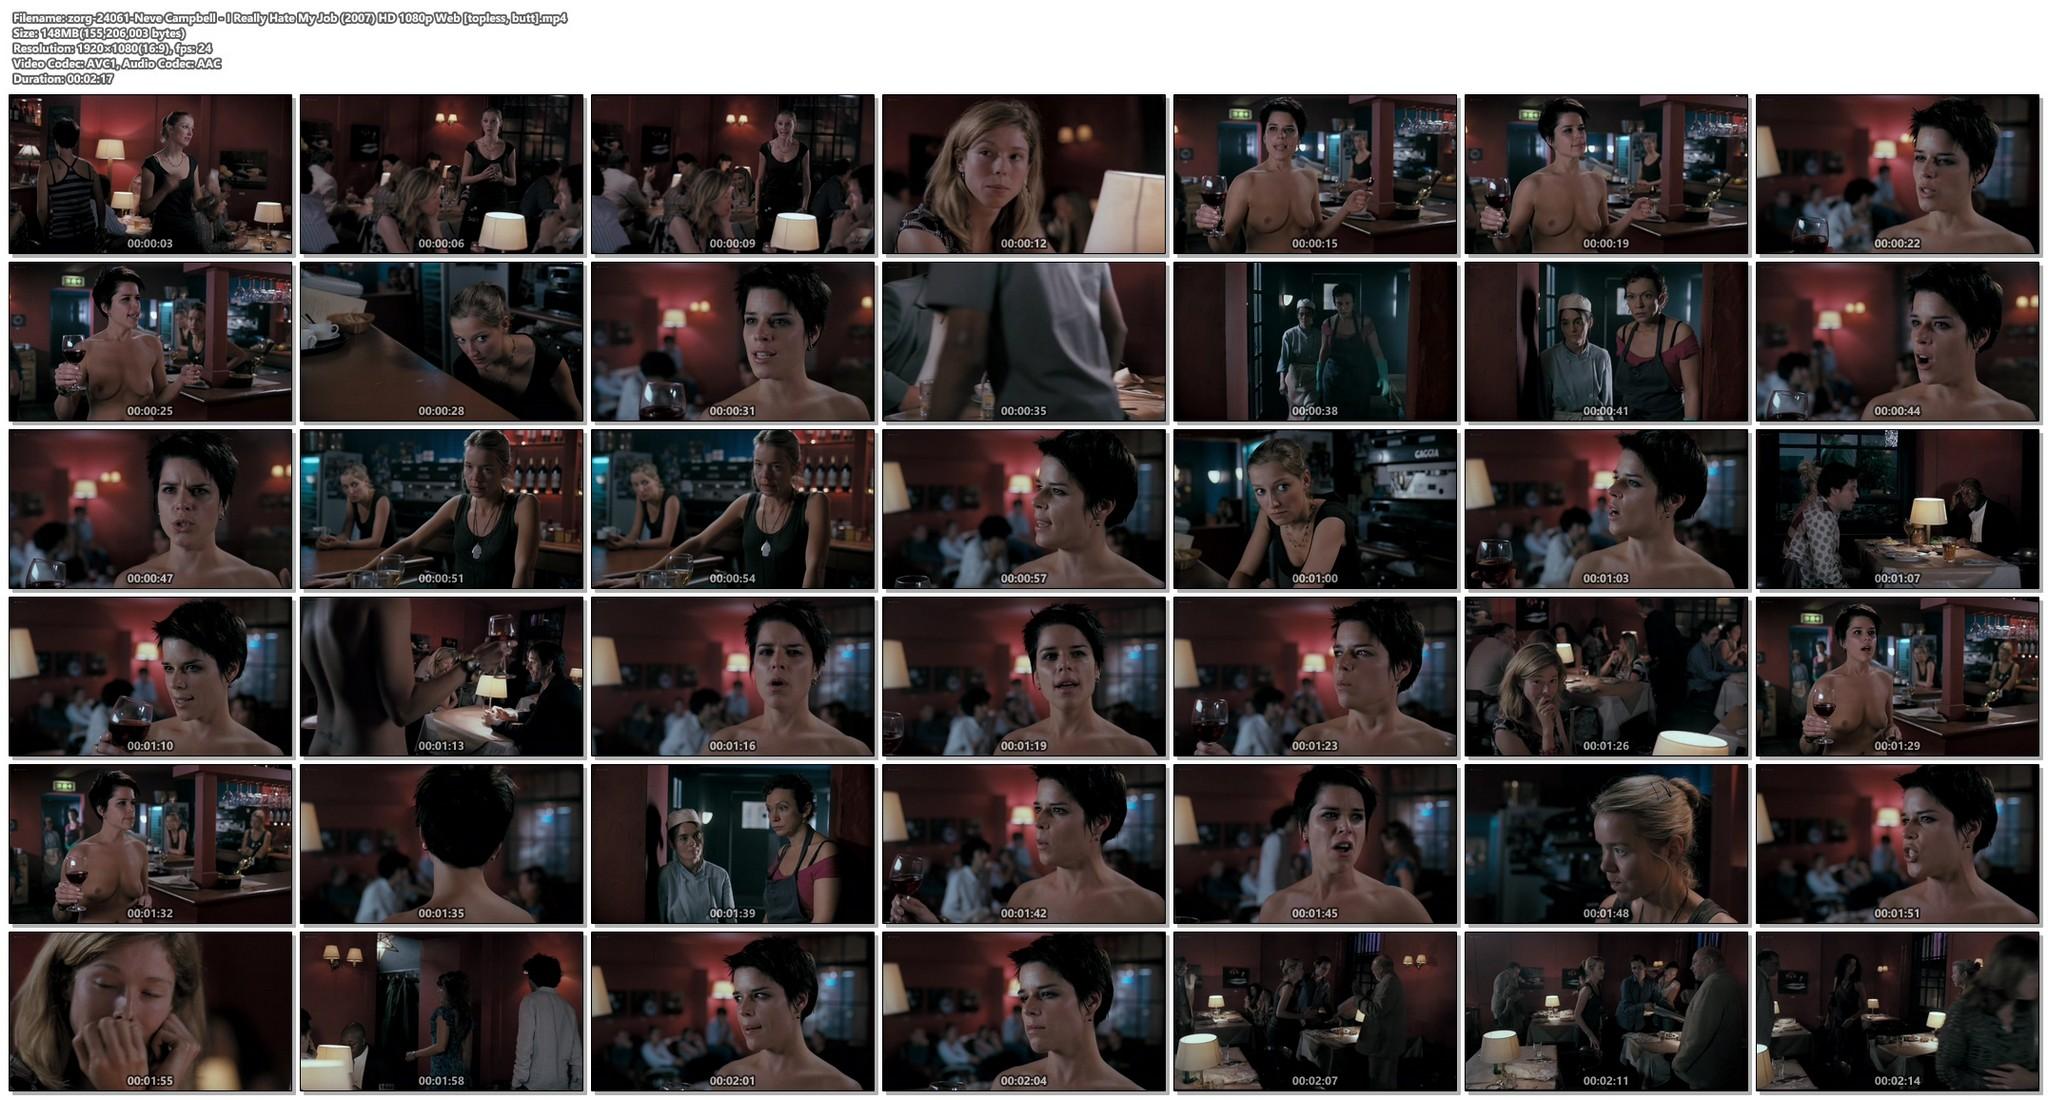 Stella francheschi breasts, butt scene in erica campbell